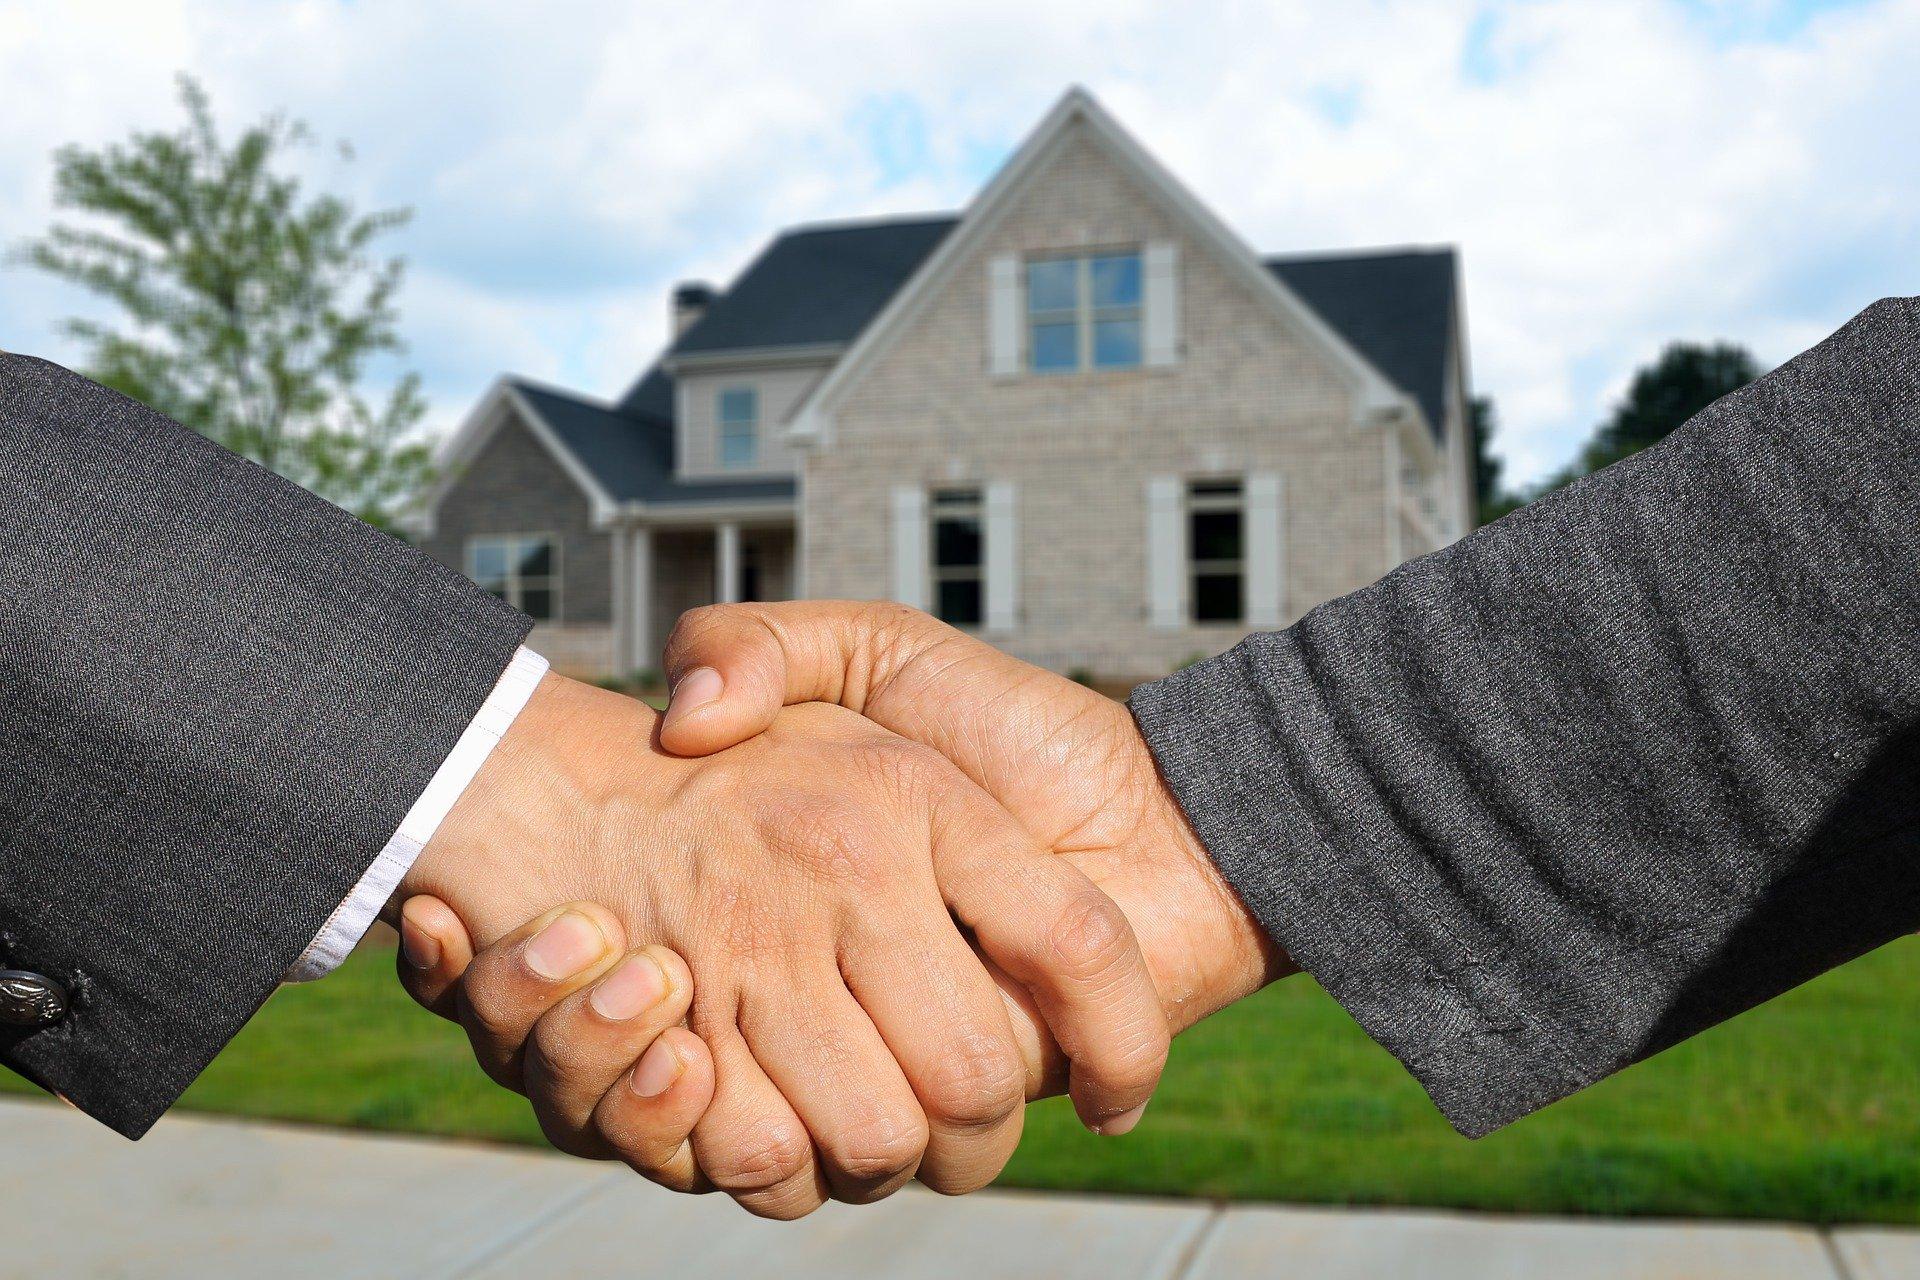 Calculer une plus-value immobilière